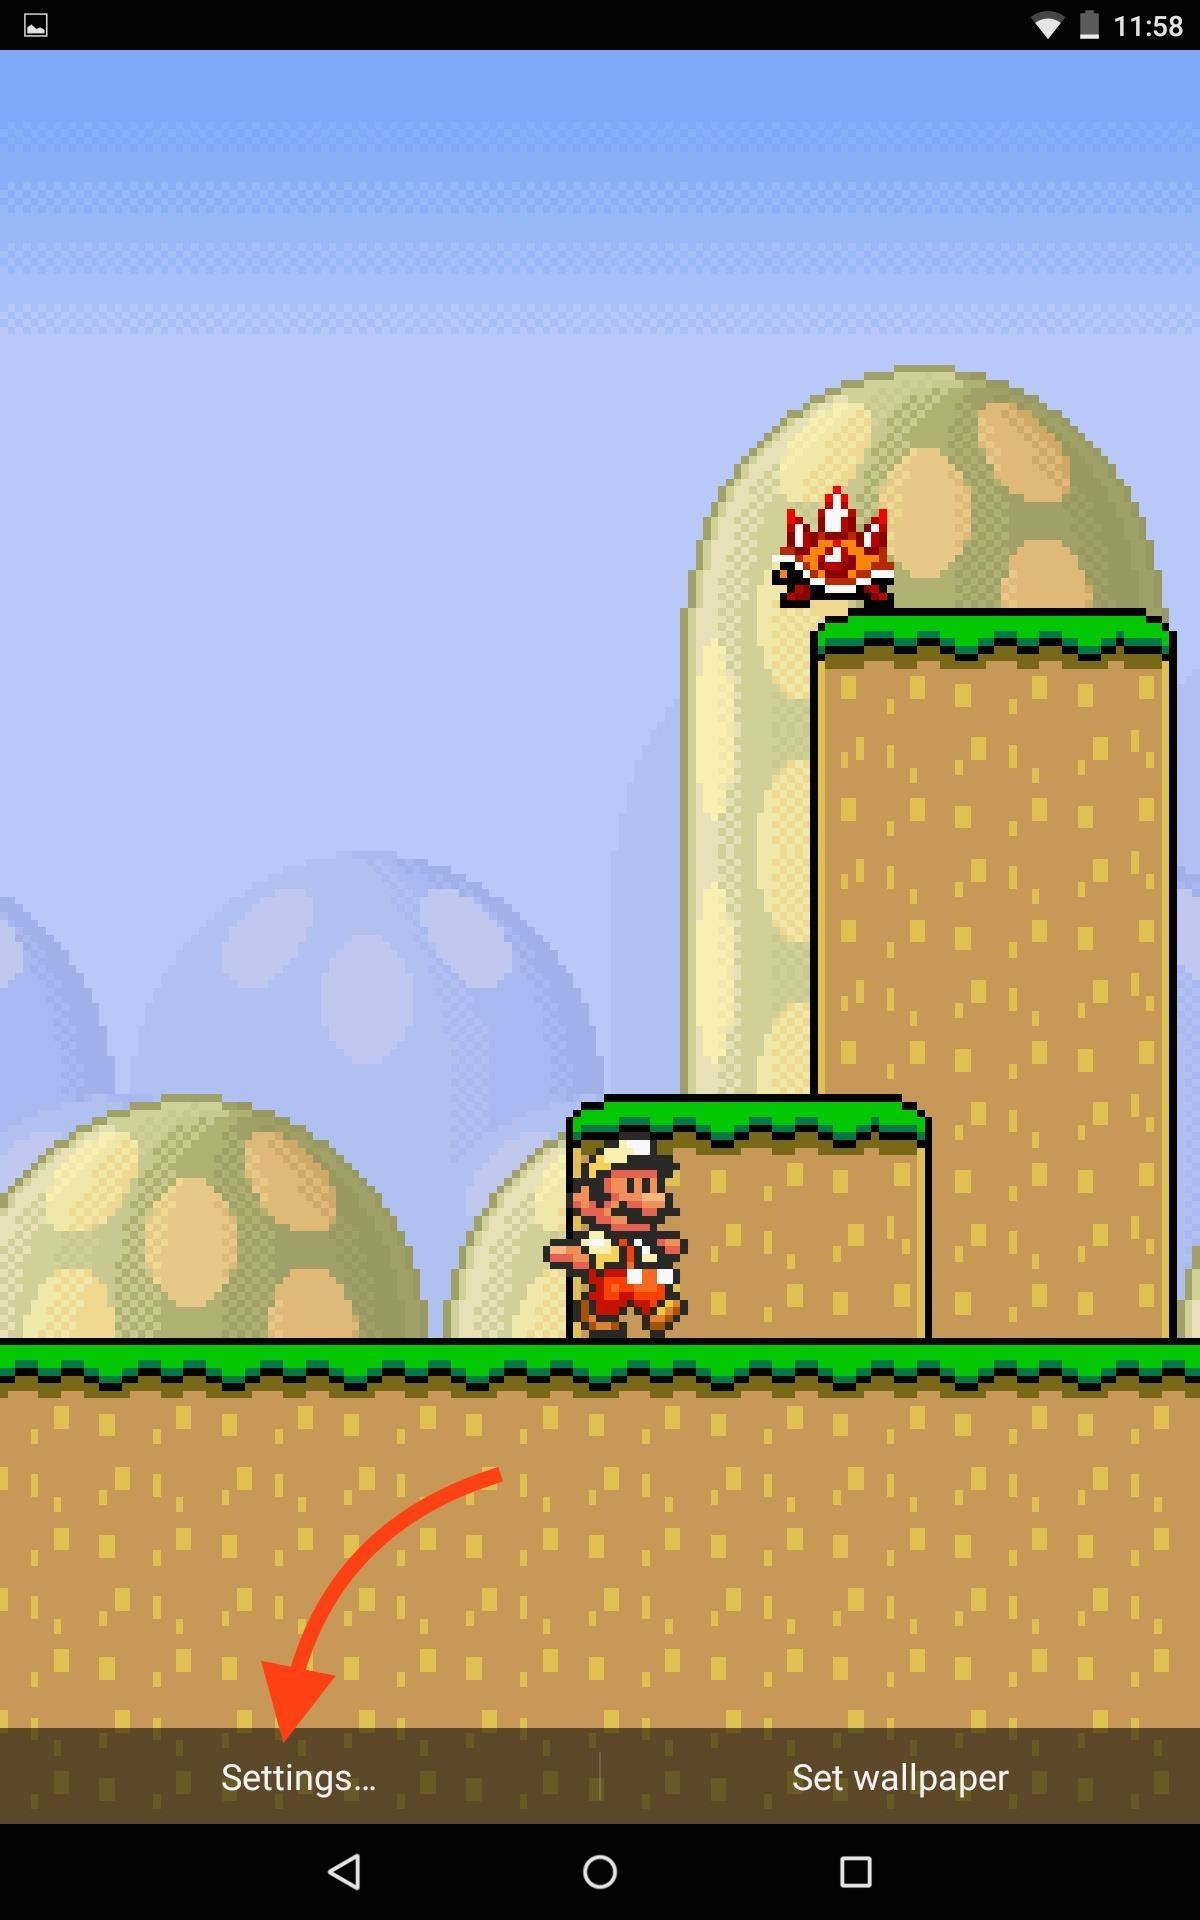 Step 4adjust Mario Live Wallpaper Super Mario Live Wallpaper Iphone 2102902 Hd Wallpaper Backgrounds Download